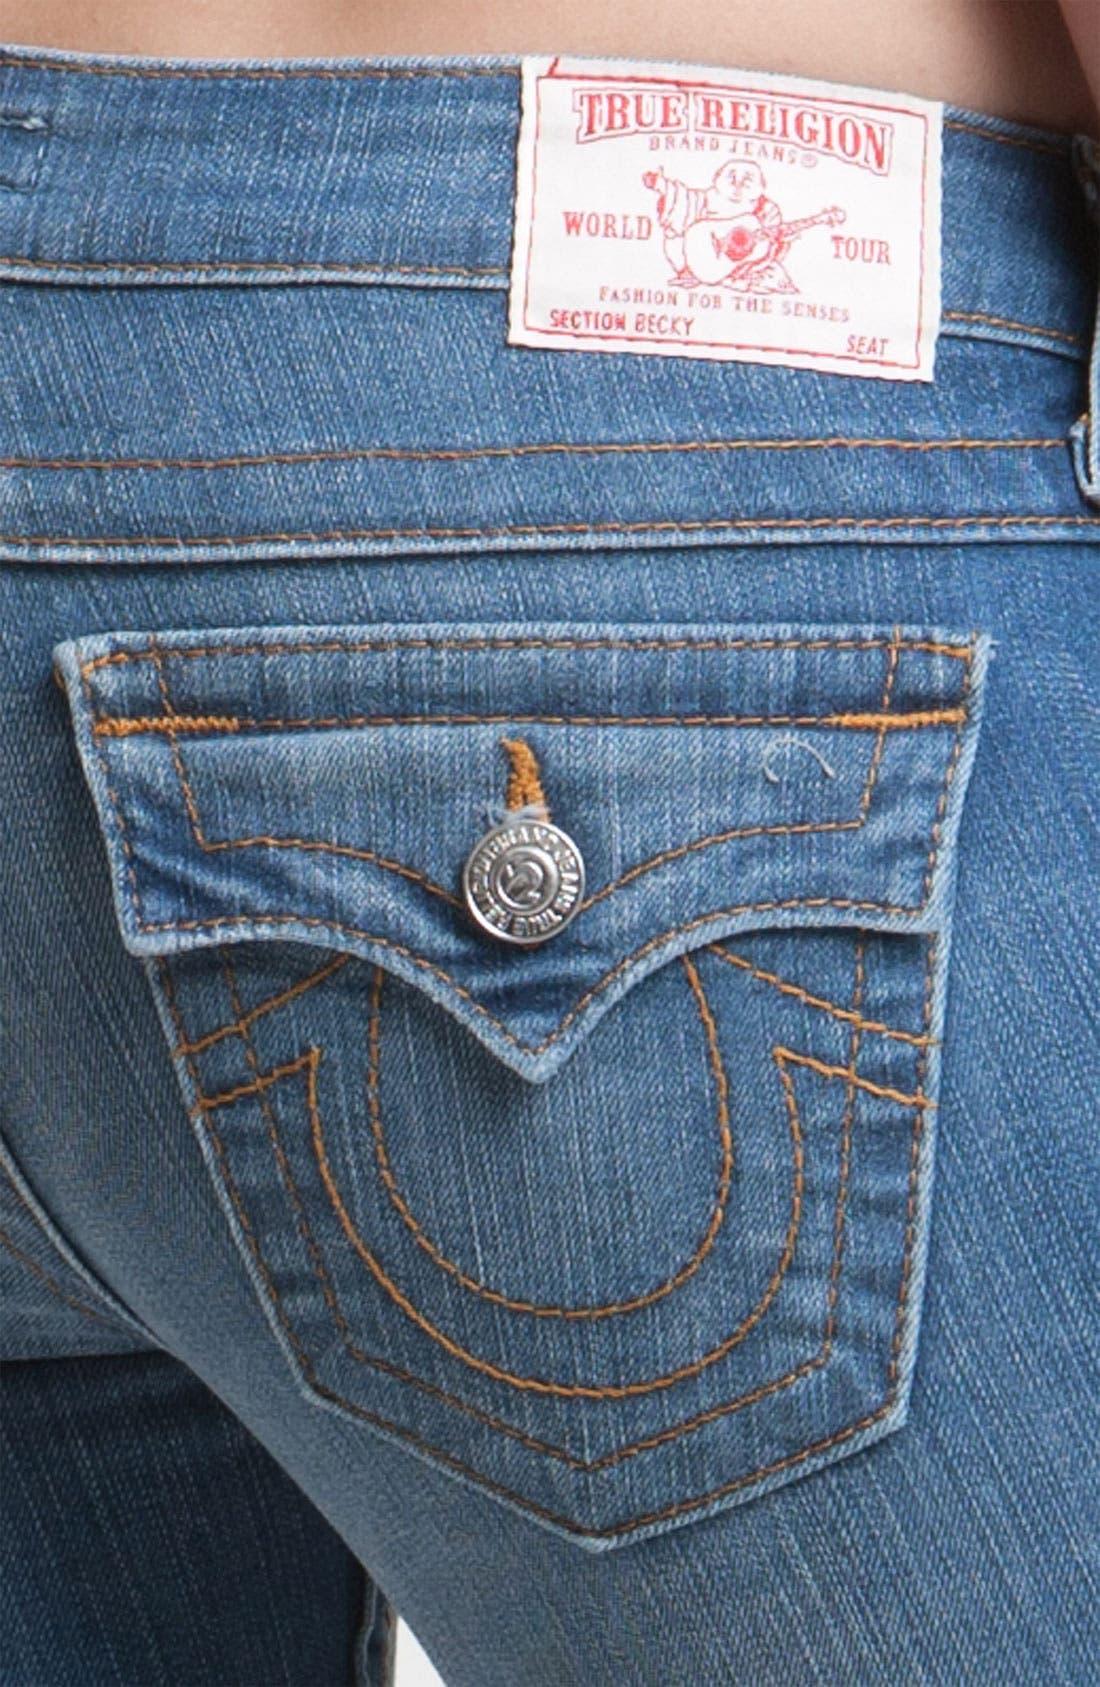 Alternate Image 3  - True Religion Brand Jeans 'Becky' Bootcut Jeans (Short Fuse)(Petite)